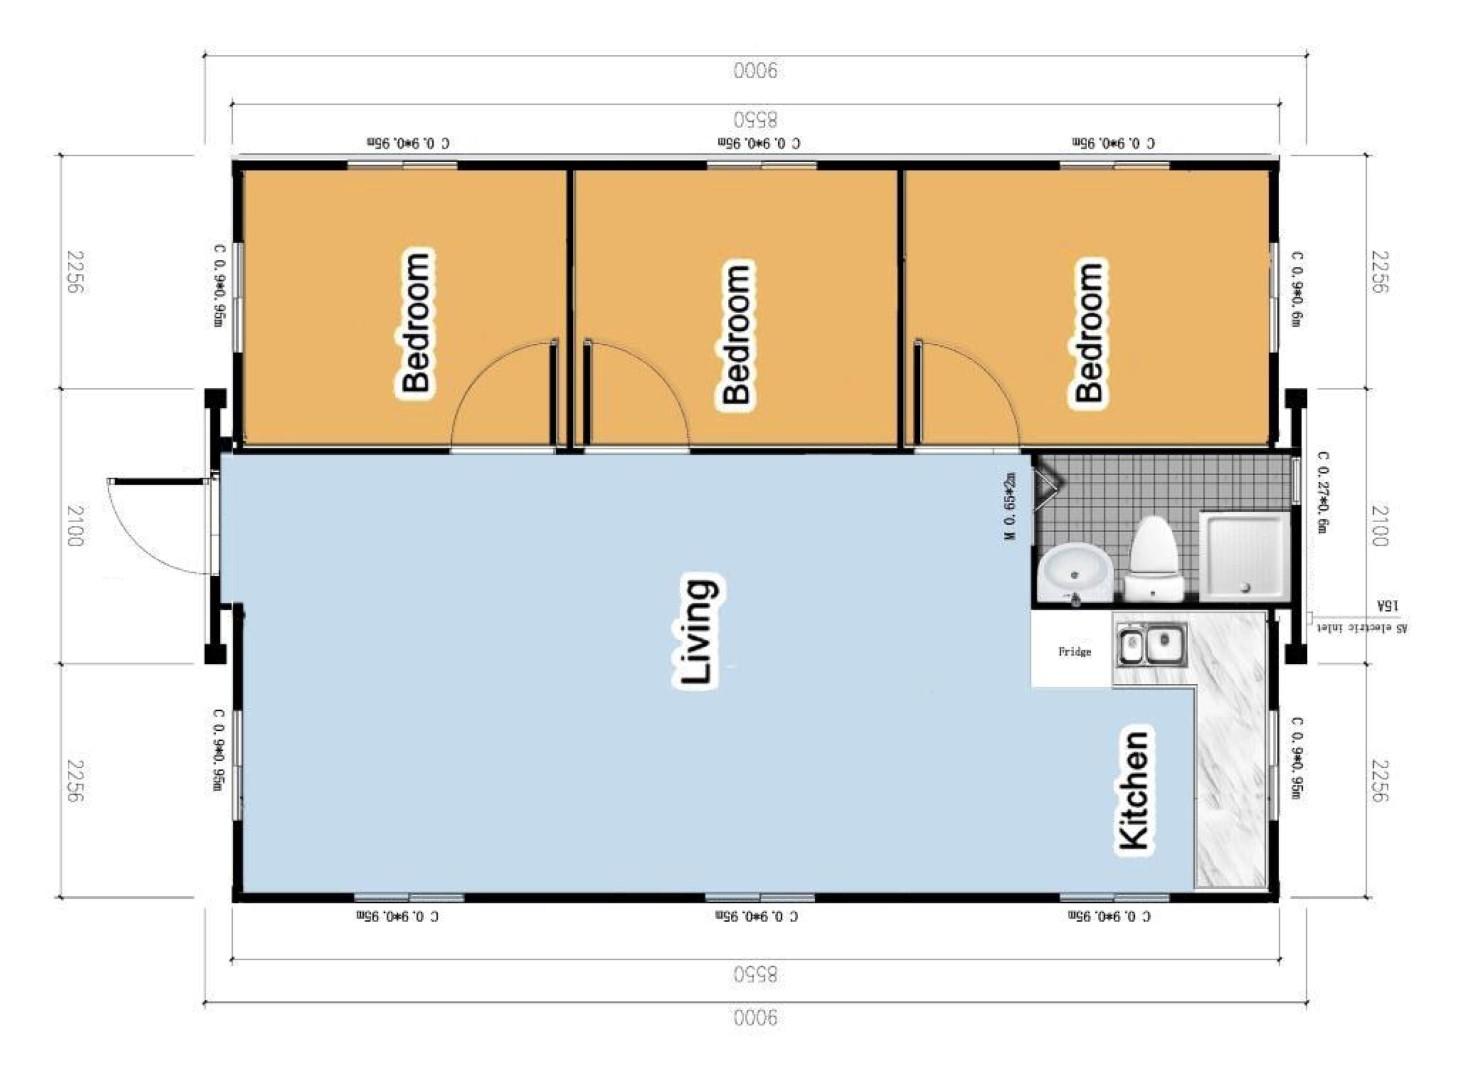 The Moreton 3 Bedroom Granny Flat floor plan